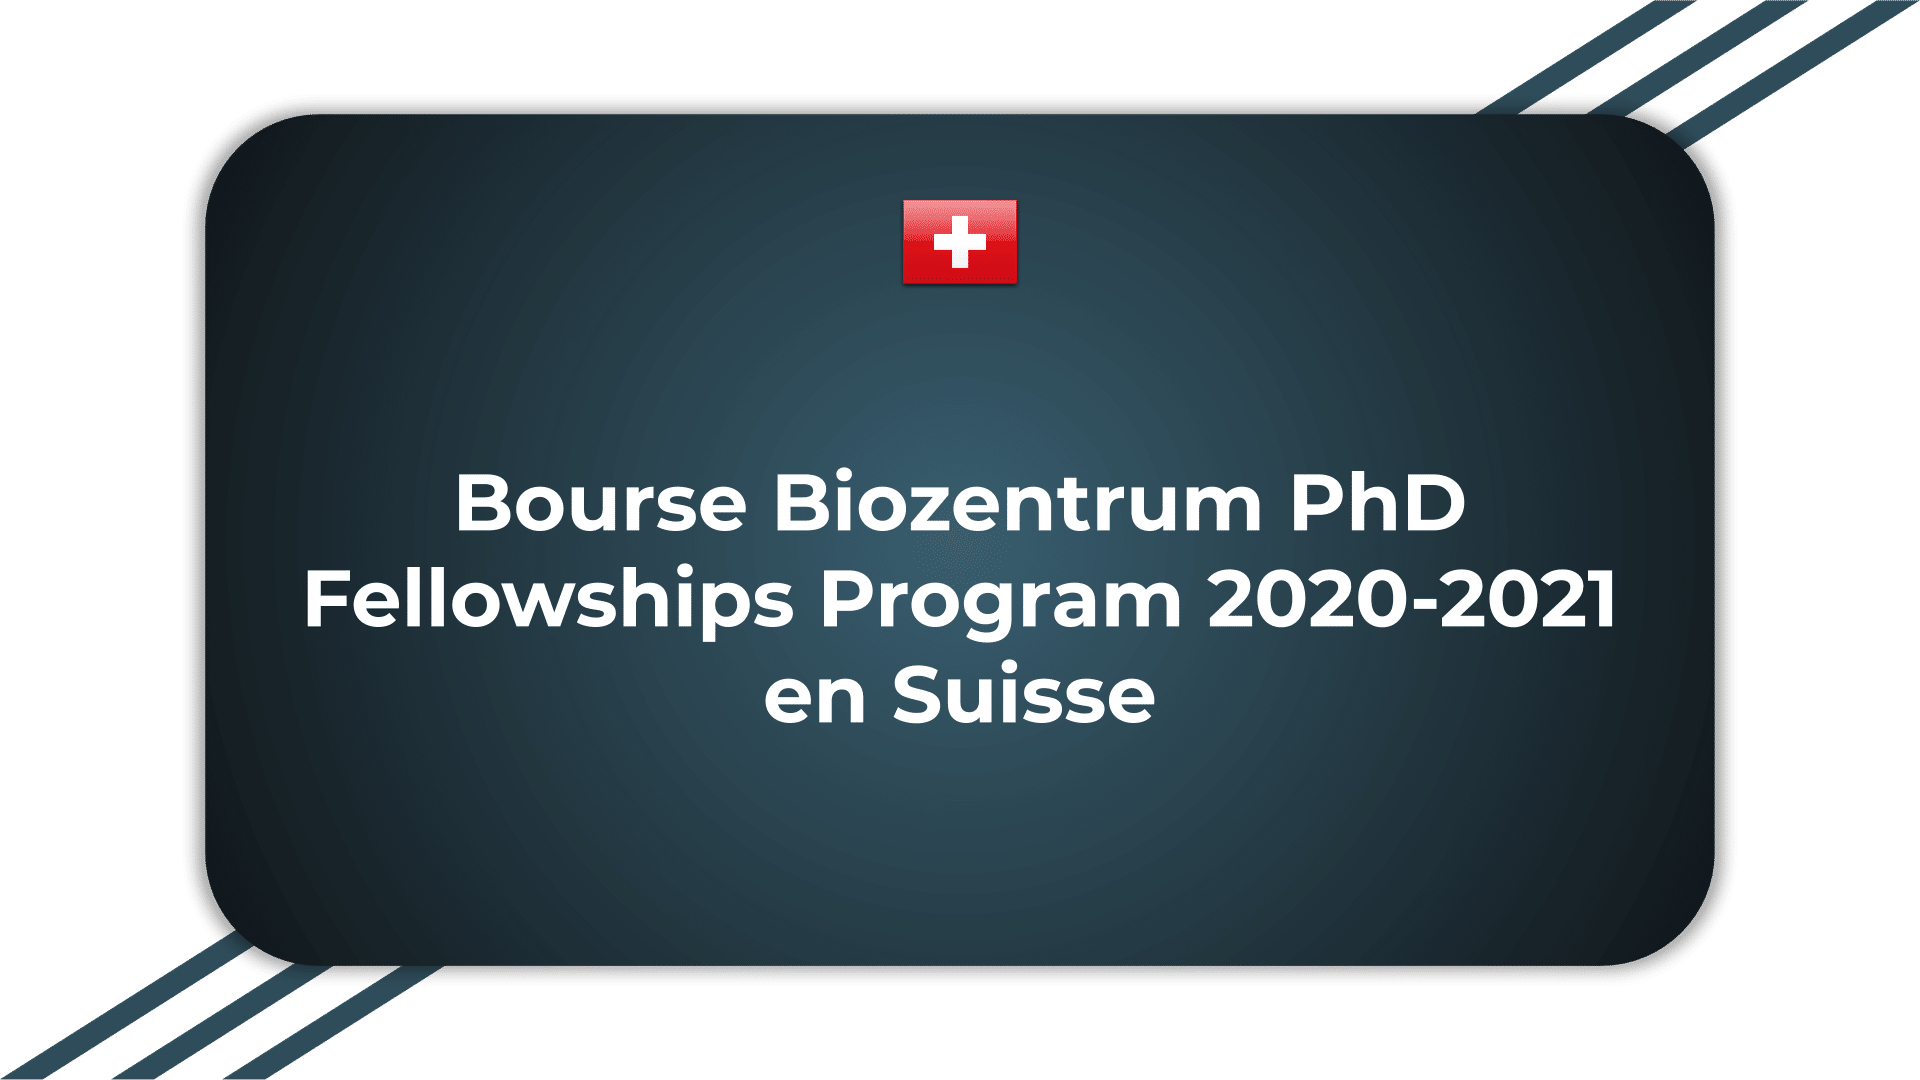 Bourse Biozentrum PhD Fellowships Program 2020-2021 en Suisse